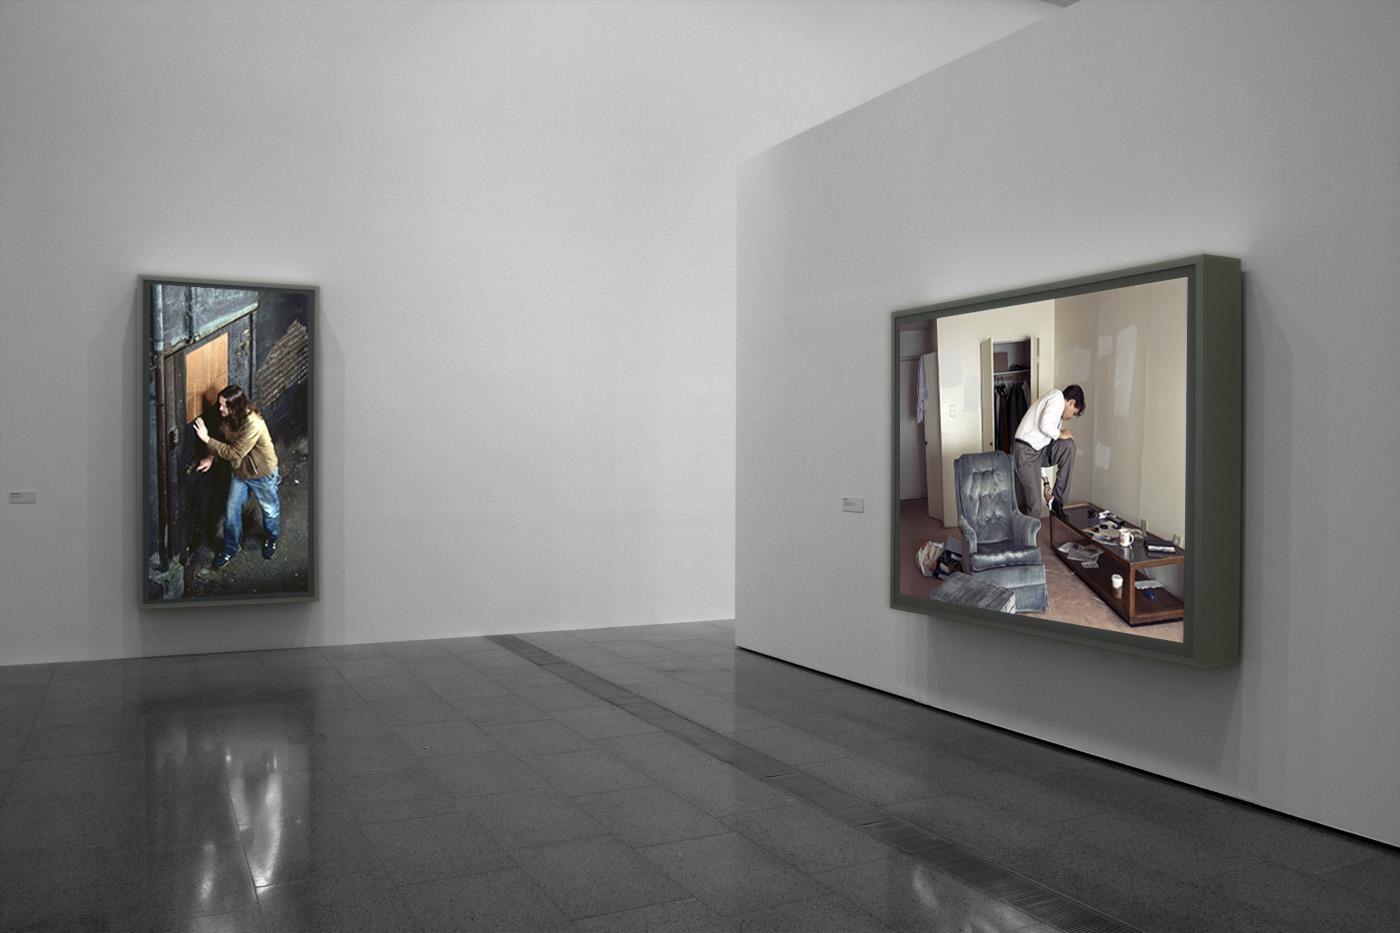 Transparency In Light Box | Art Blart Throughout Wall Light Box Art (View 4 of 20)